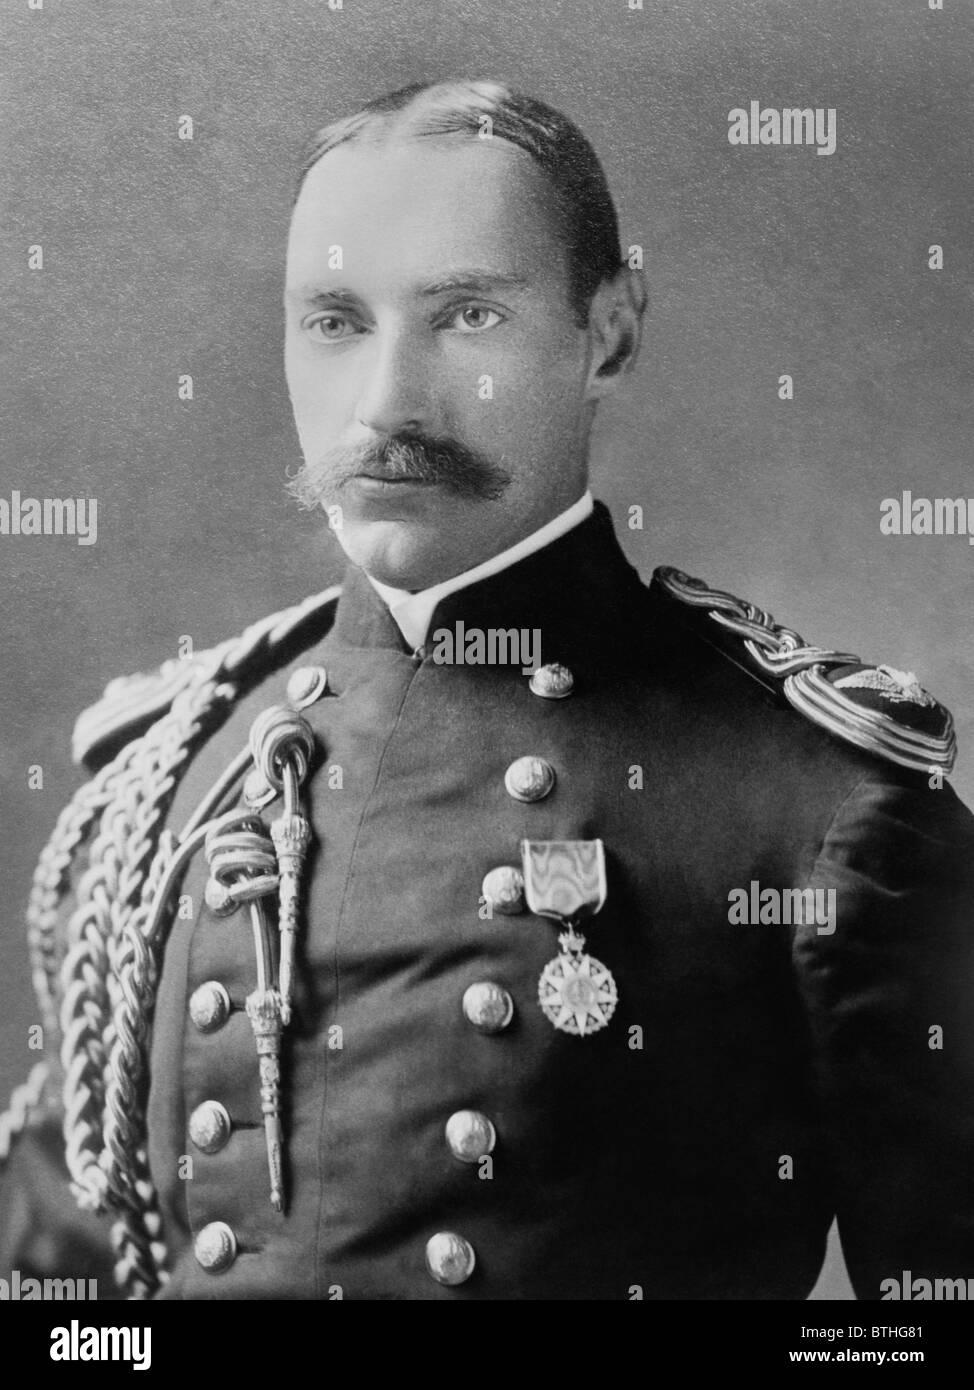 Portrait photo c1898 of millionaire American businessman + Titanic victim John Jacob Astor IV (1864 -1912) in military - Stock Image